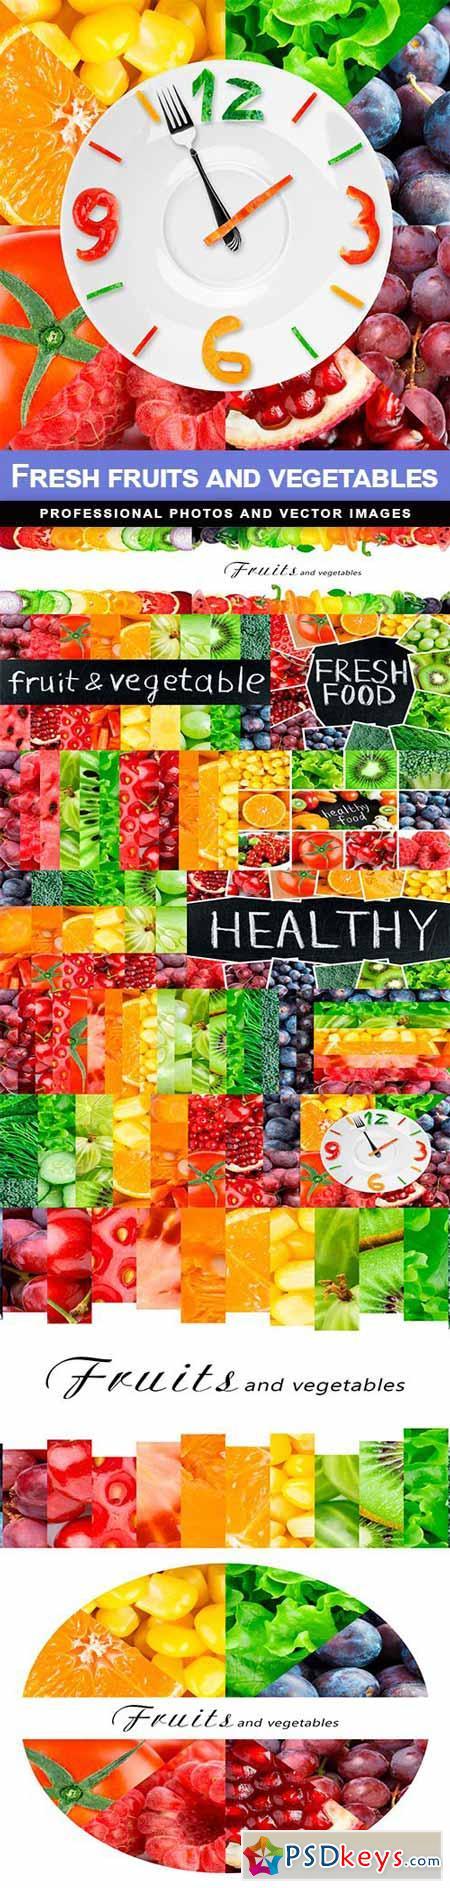 Fresh fruits and vegetables - 14 UHQ JPEG